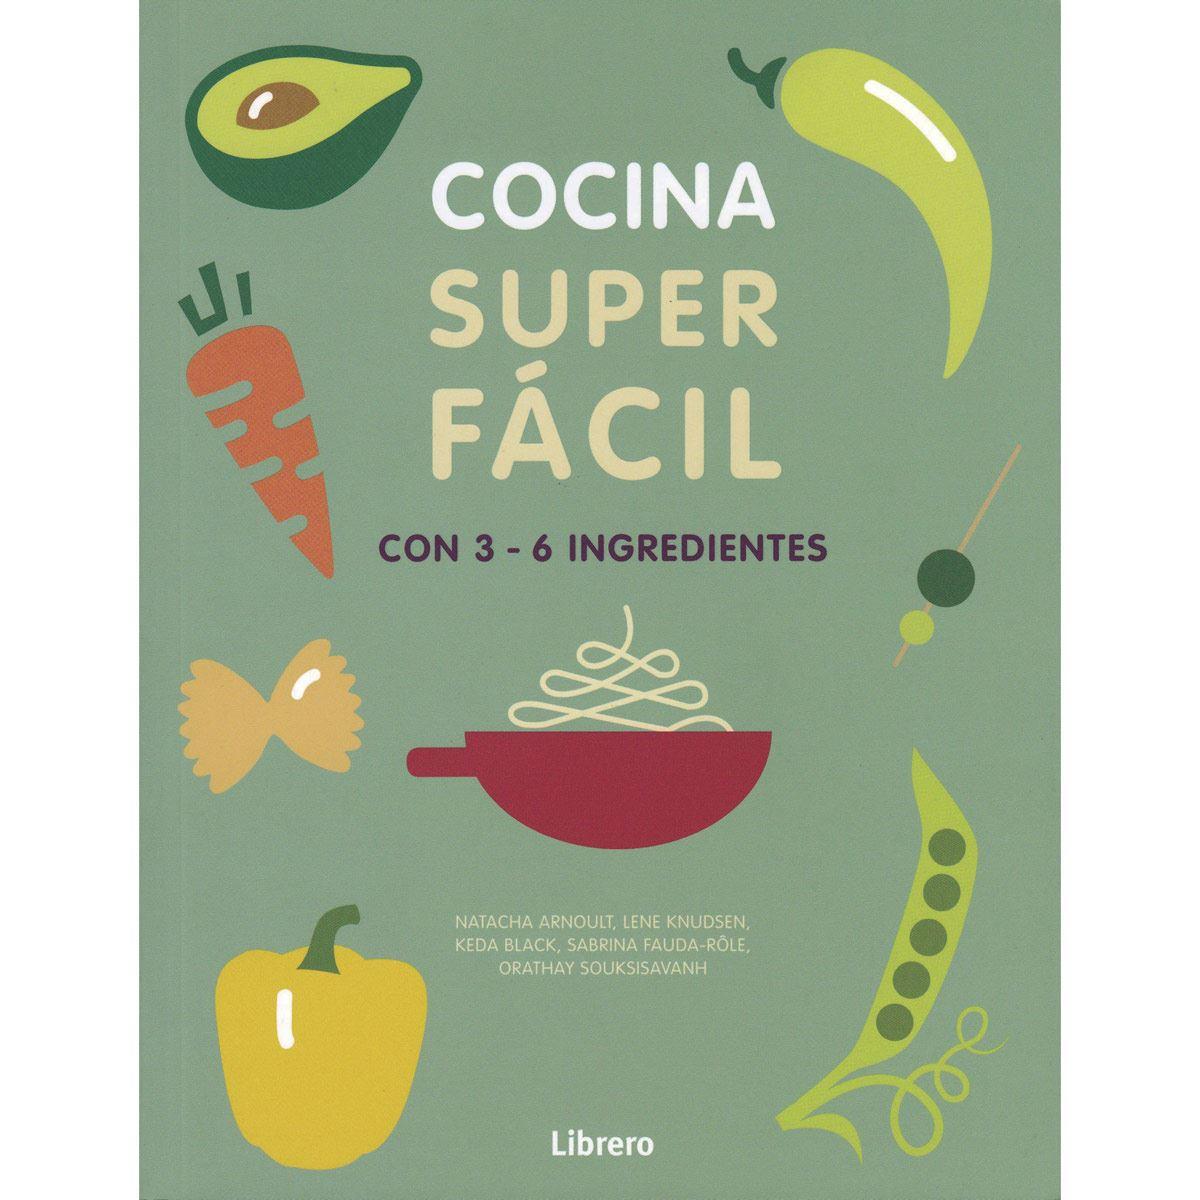 Cocina Súper Fácil. 129 Recetas